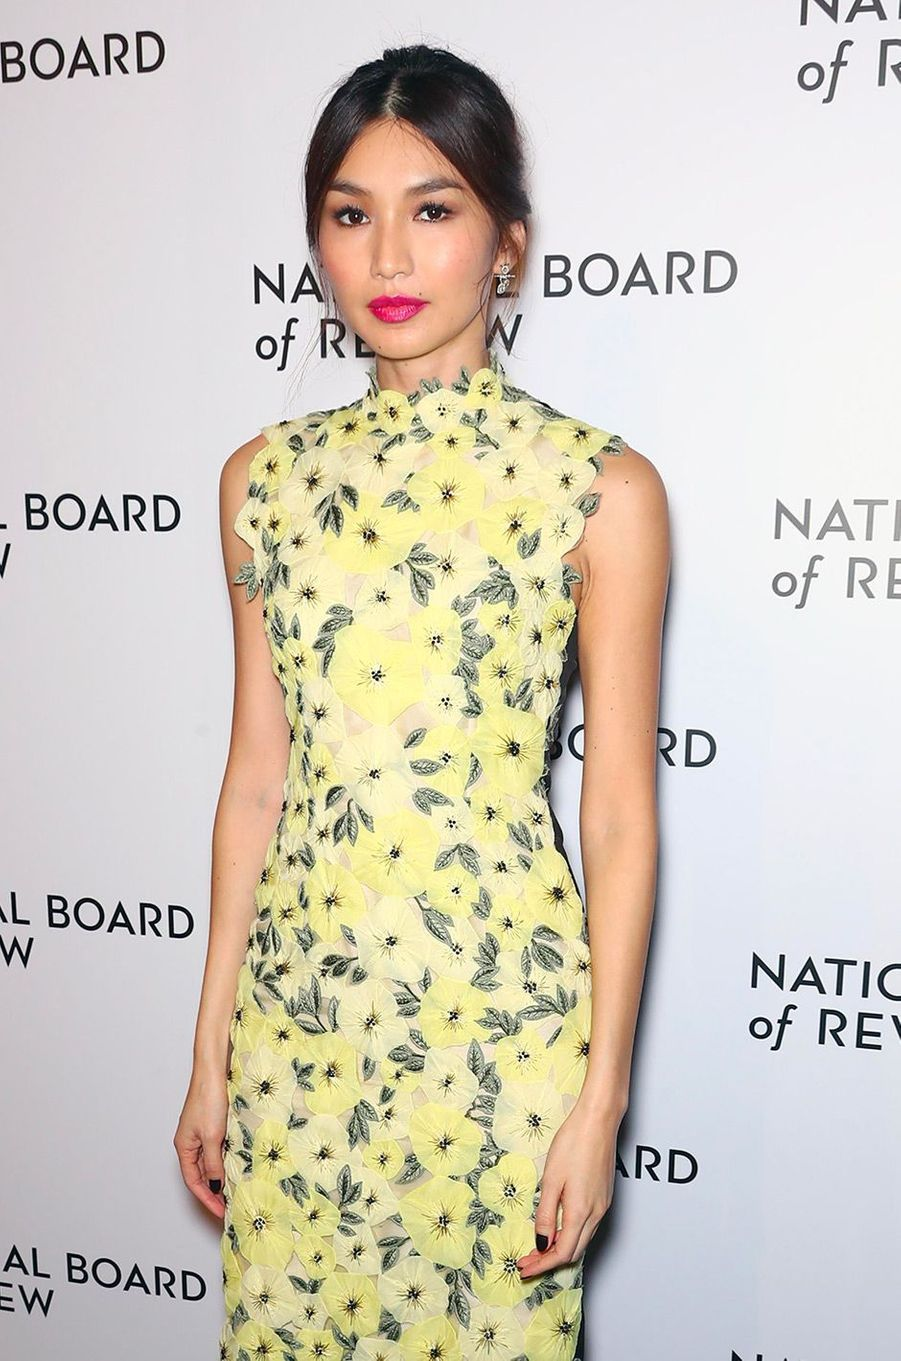 Gemma Chan au National Board of Review Gala, mardi 8 janvier, à New York